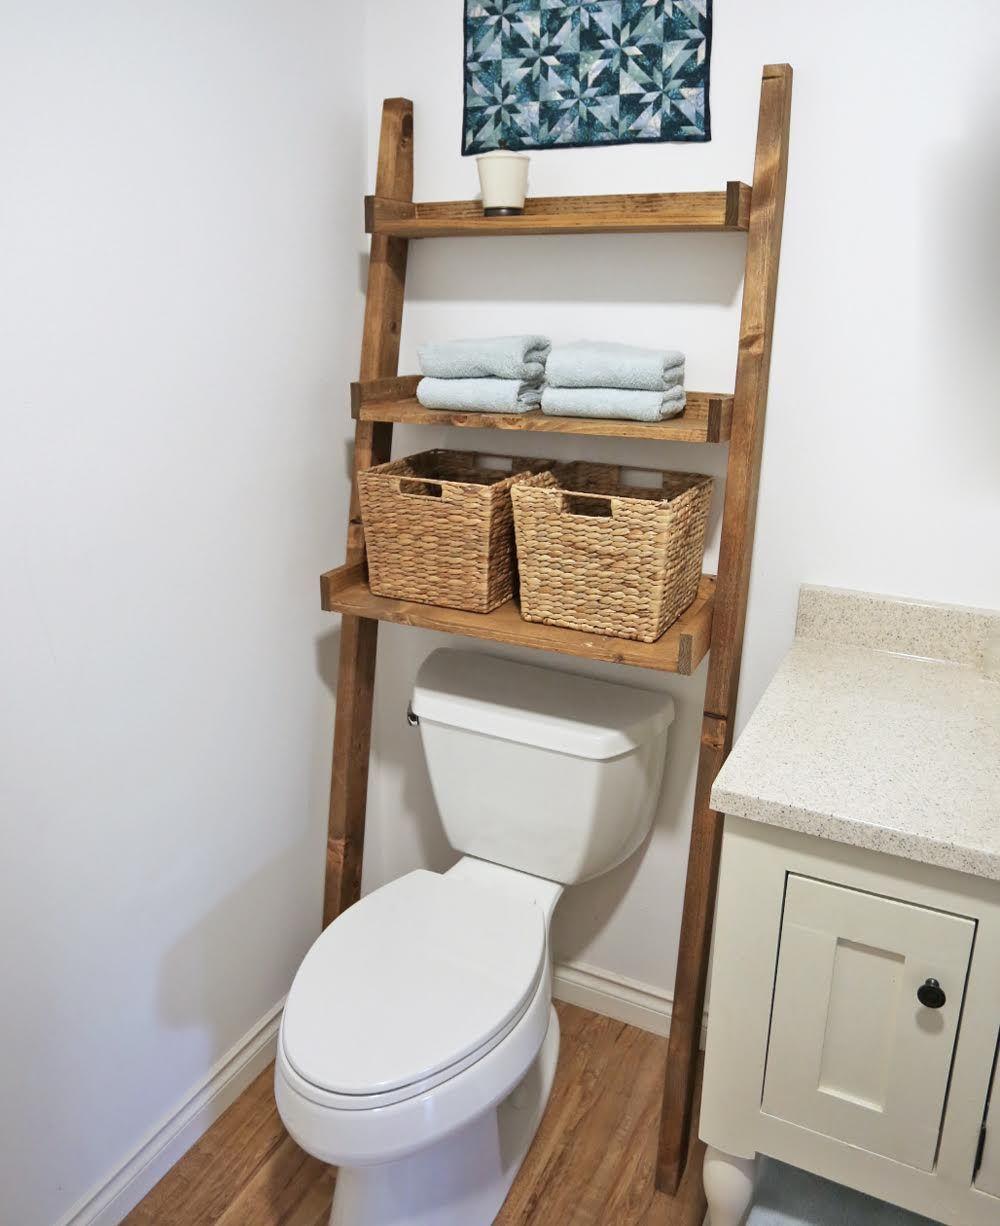 Leaning bathroom ladder over toilet shelf knockoff wood